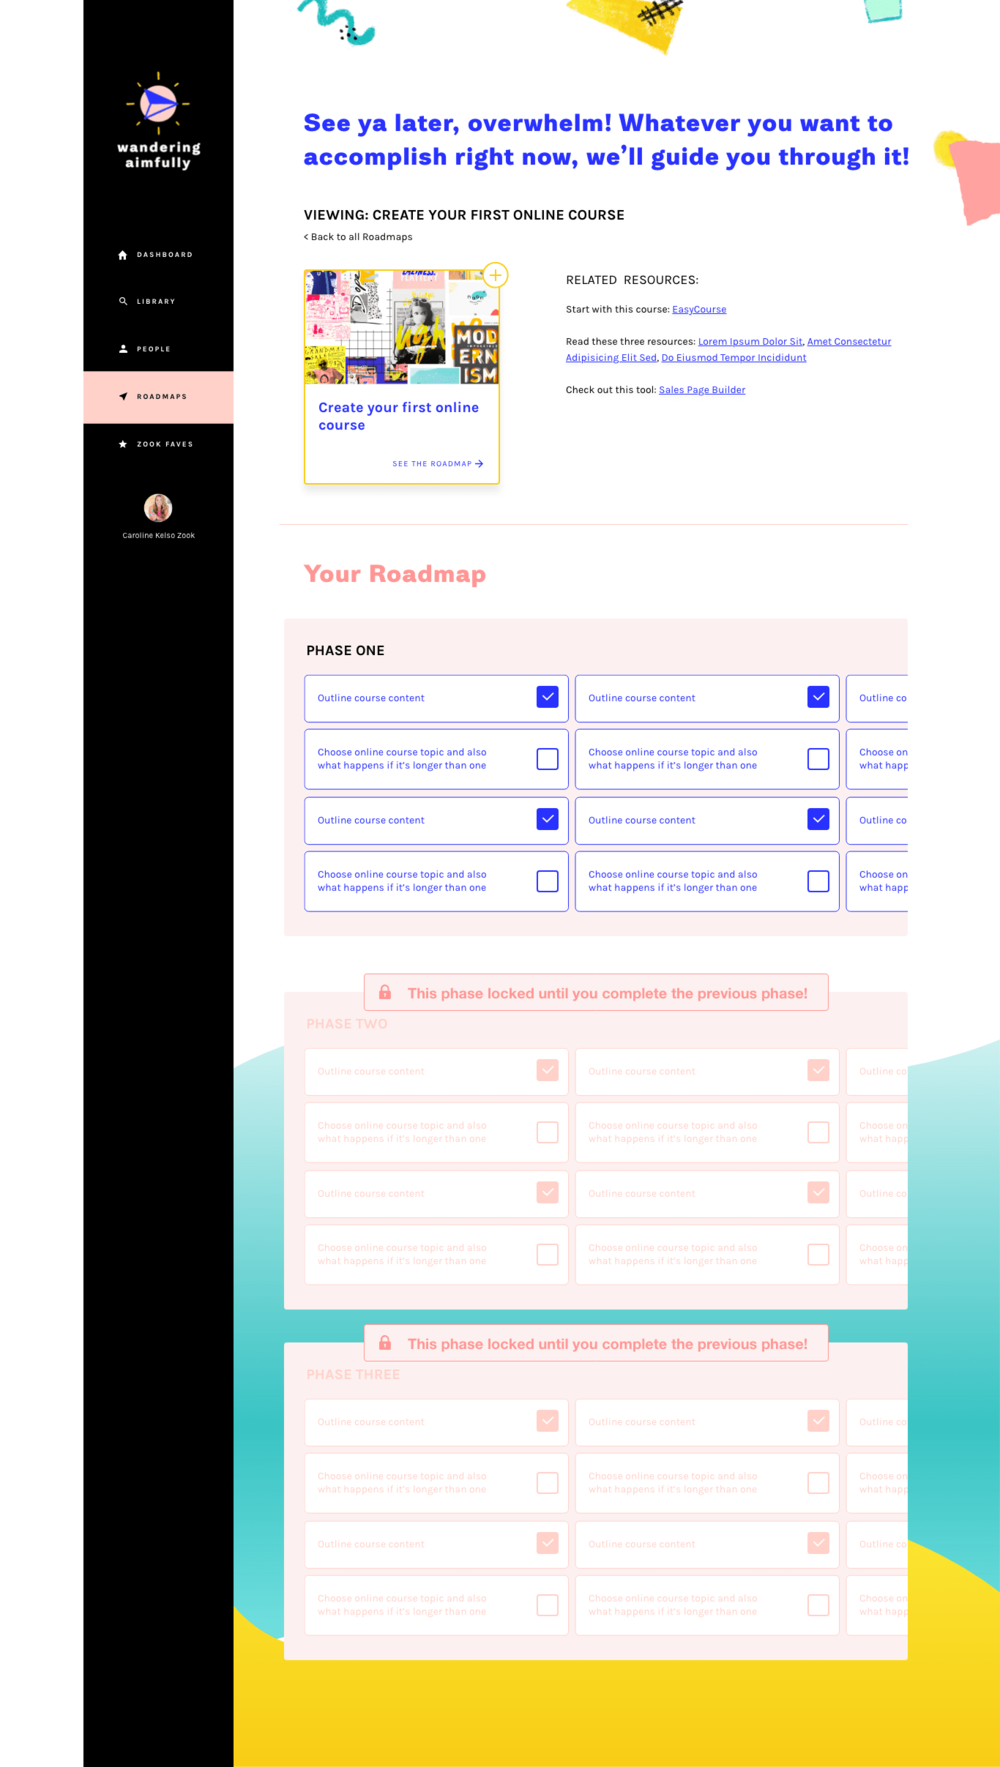 xl @ 1366x768 - WAIM Roadmaps – View Roadmap@2x-min.png